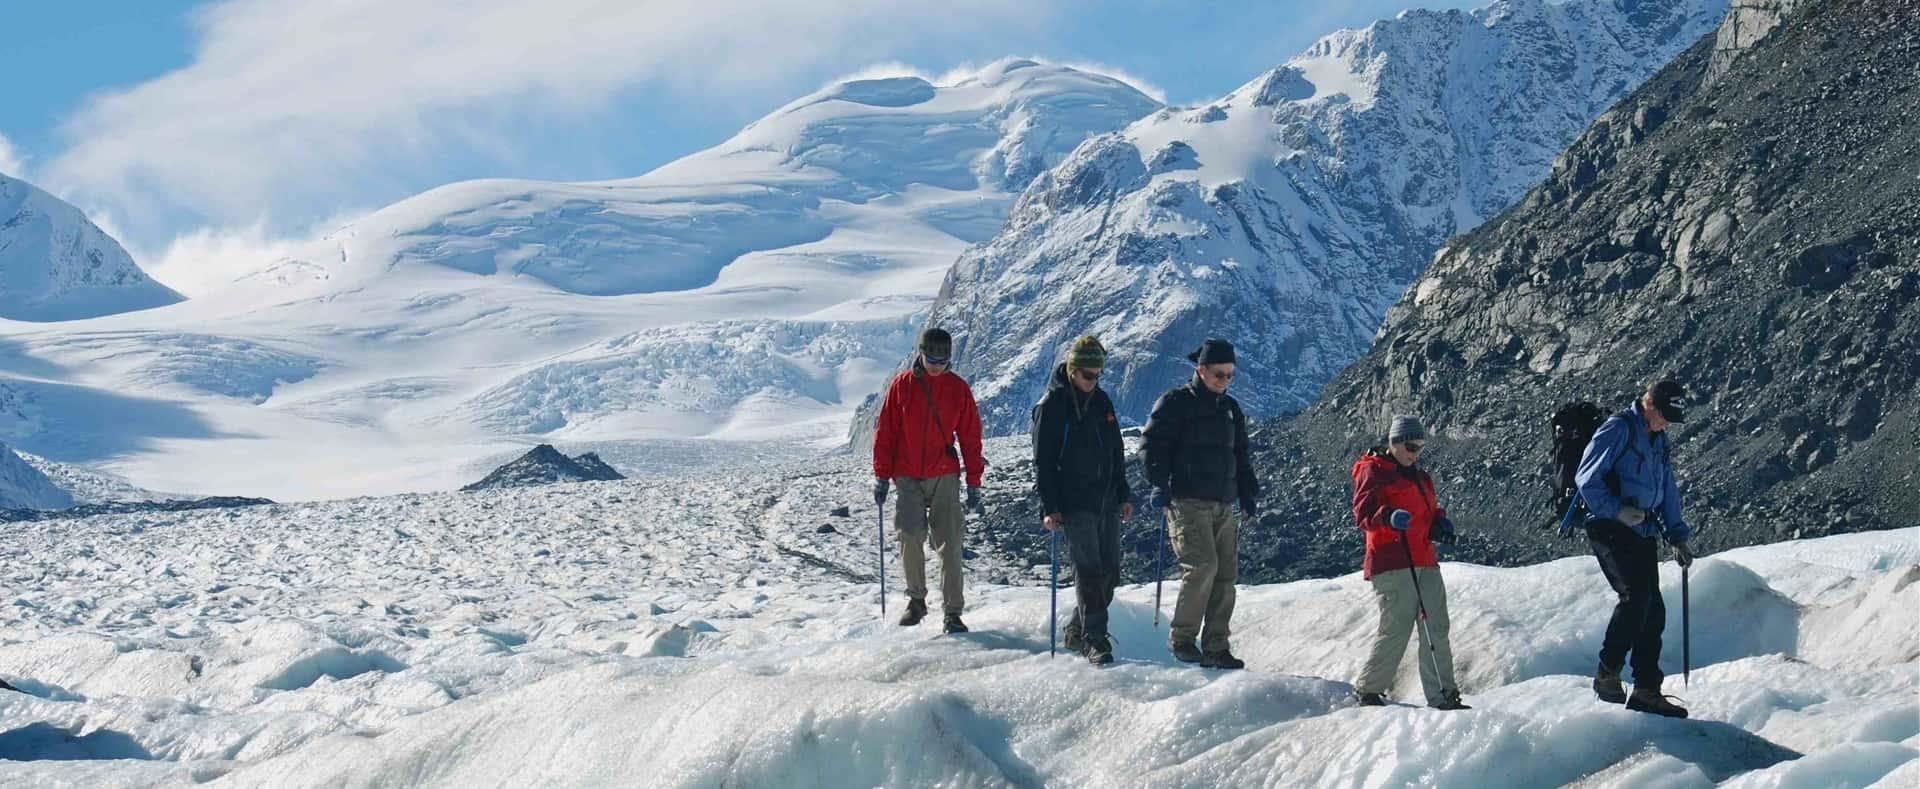 Aoraki Mount Cook National Park heli hike tour